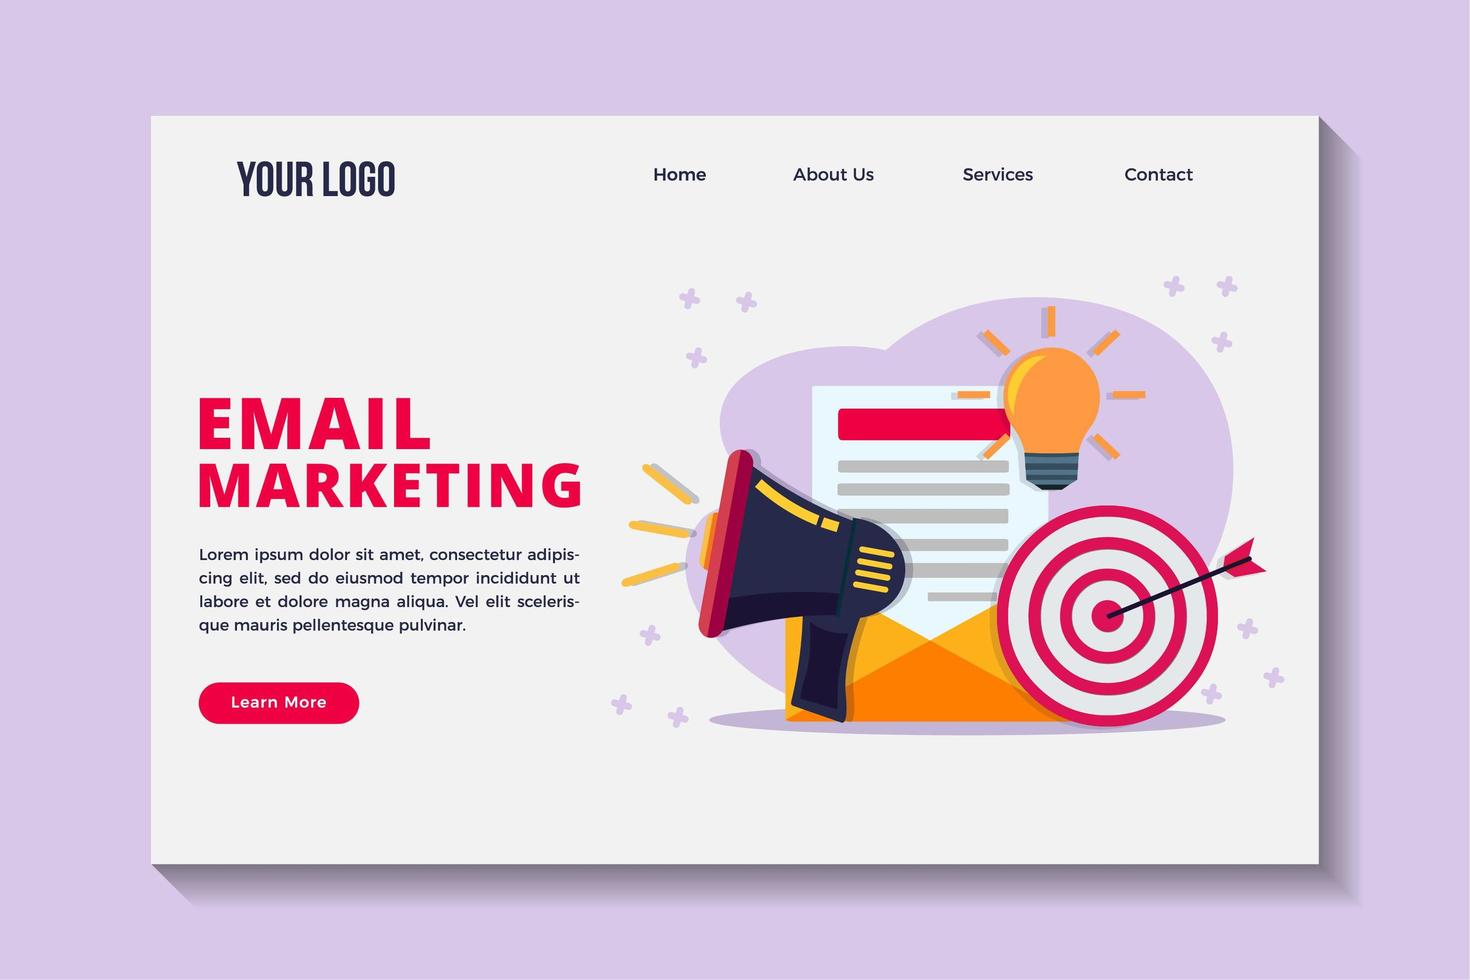 E-Mail-Marketing-Konzept Landingpage-Vorlage vektor